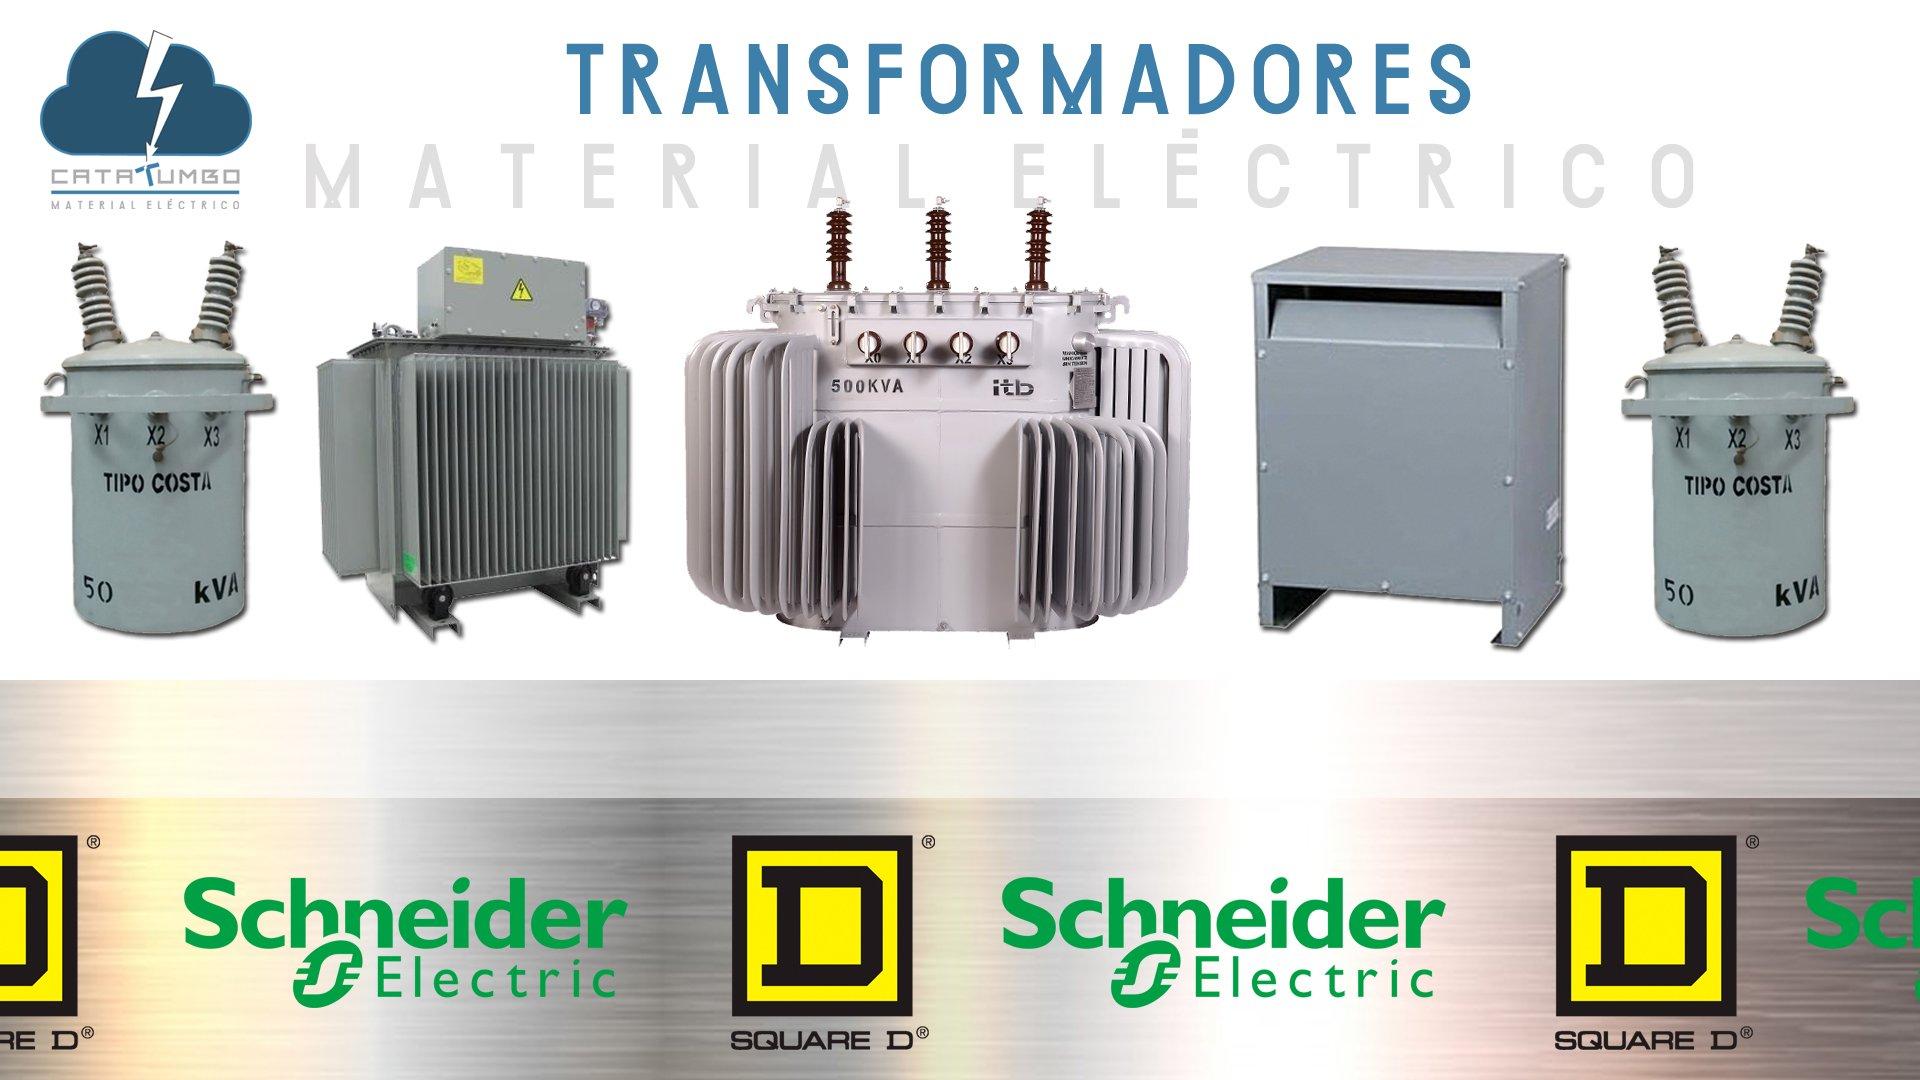 transformadores-square-d-schneider-electric-material-eléctrico-catatumbo